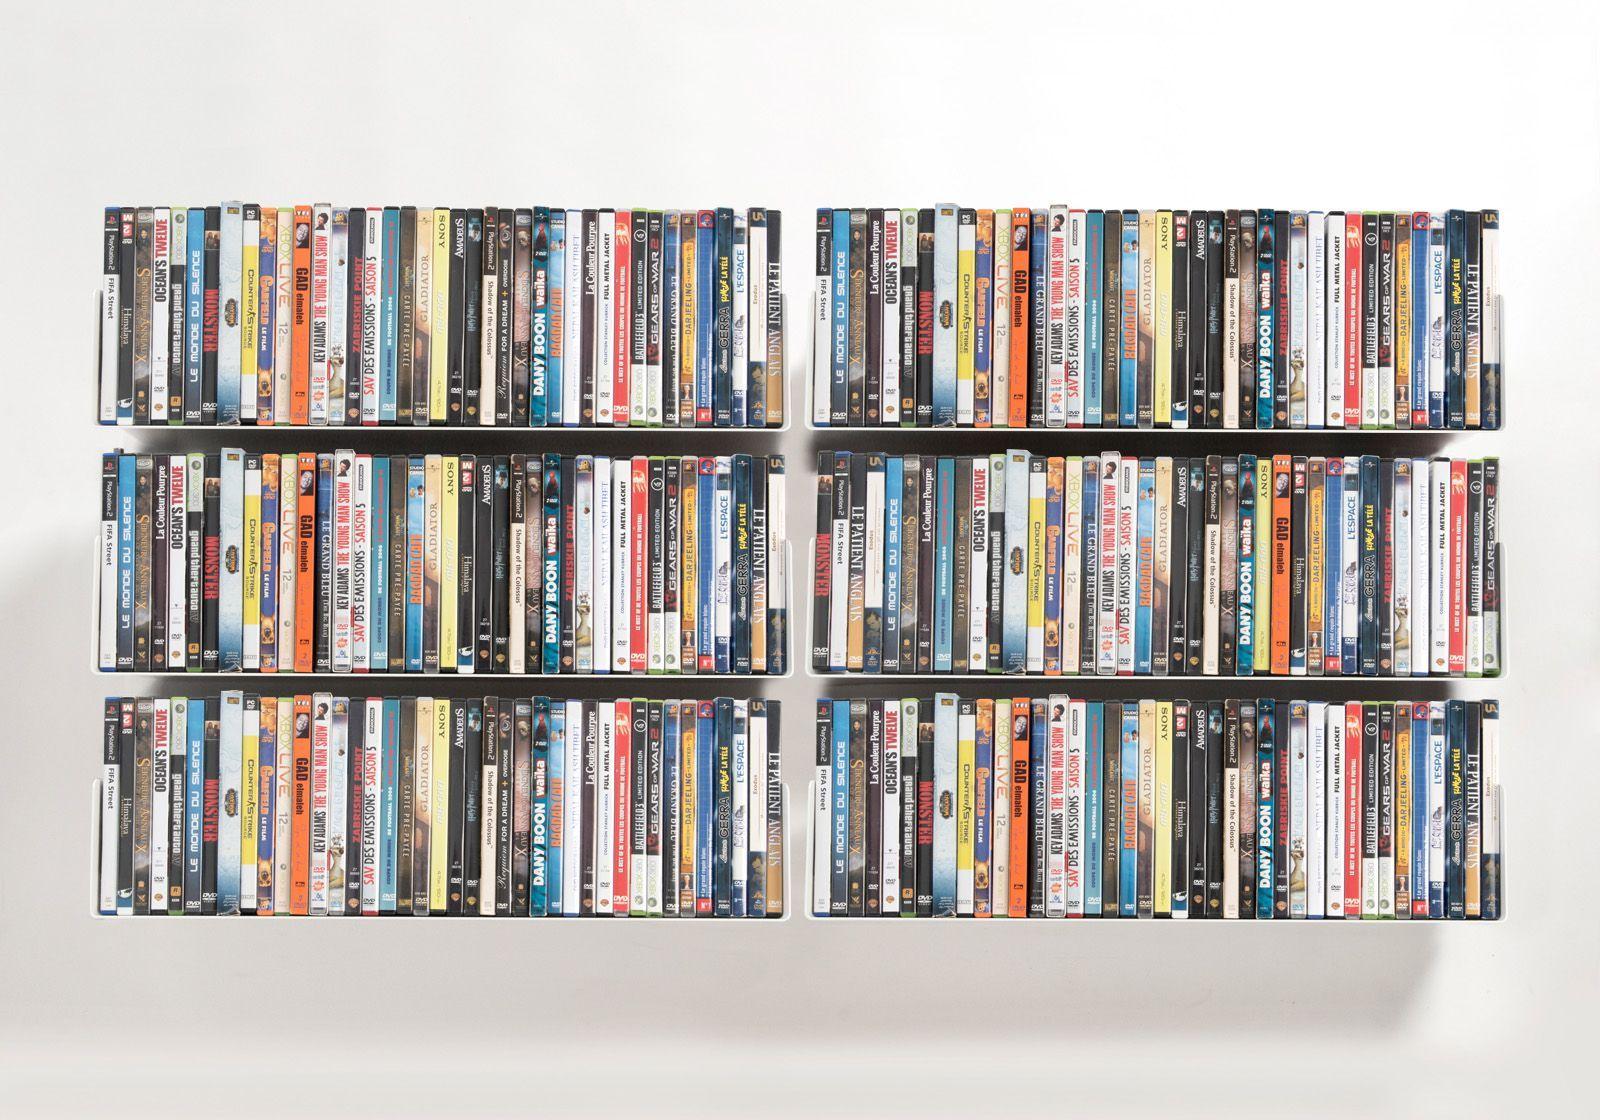 Set of 6 UDVD - DVD shelves